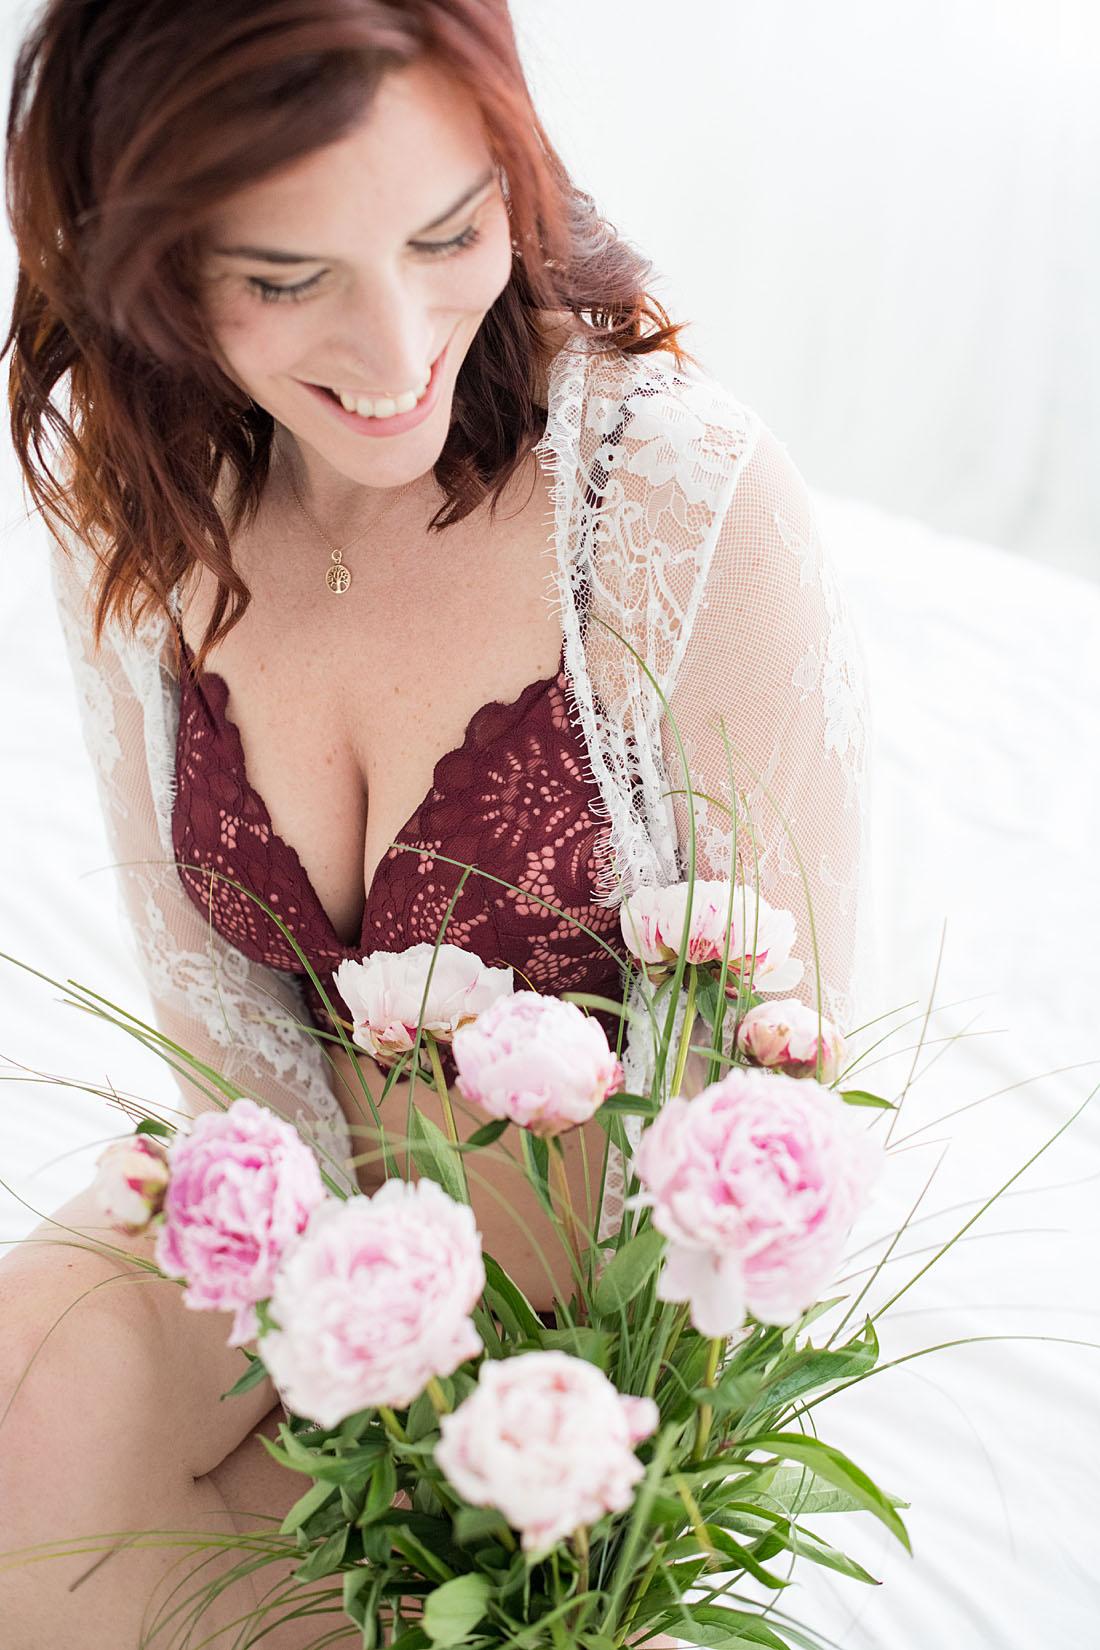 pioenrozen-bloemen-boudoir-fotoshoot